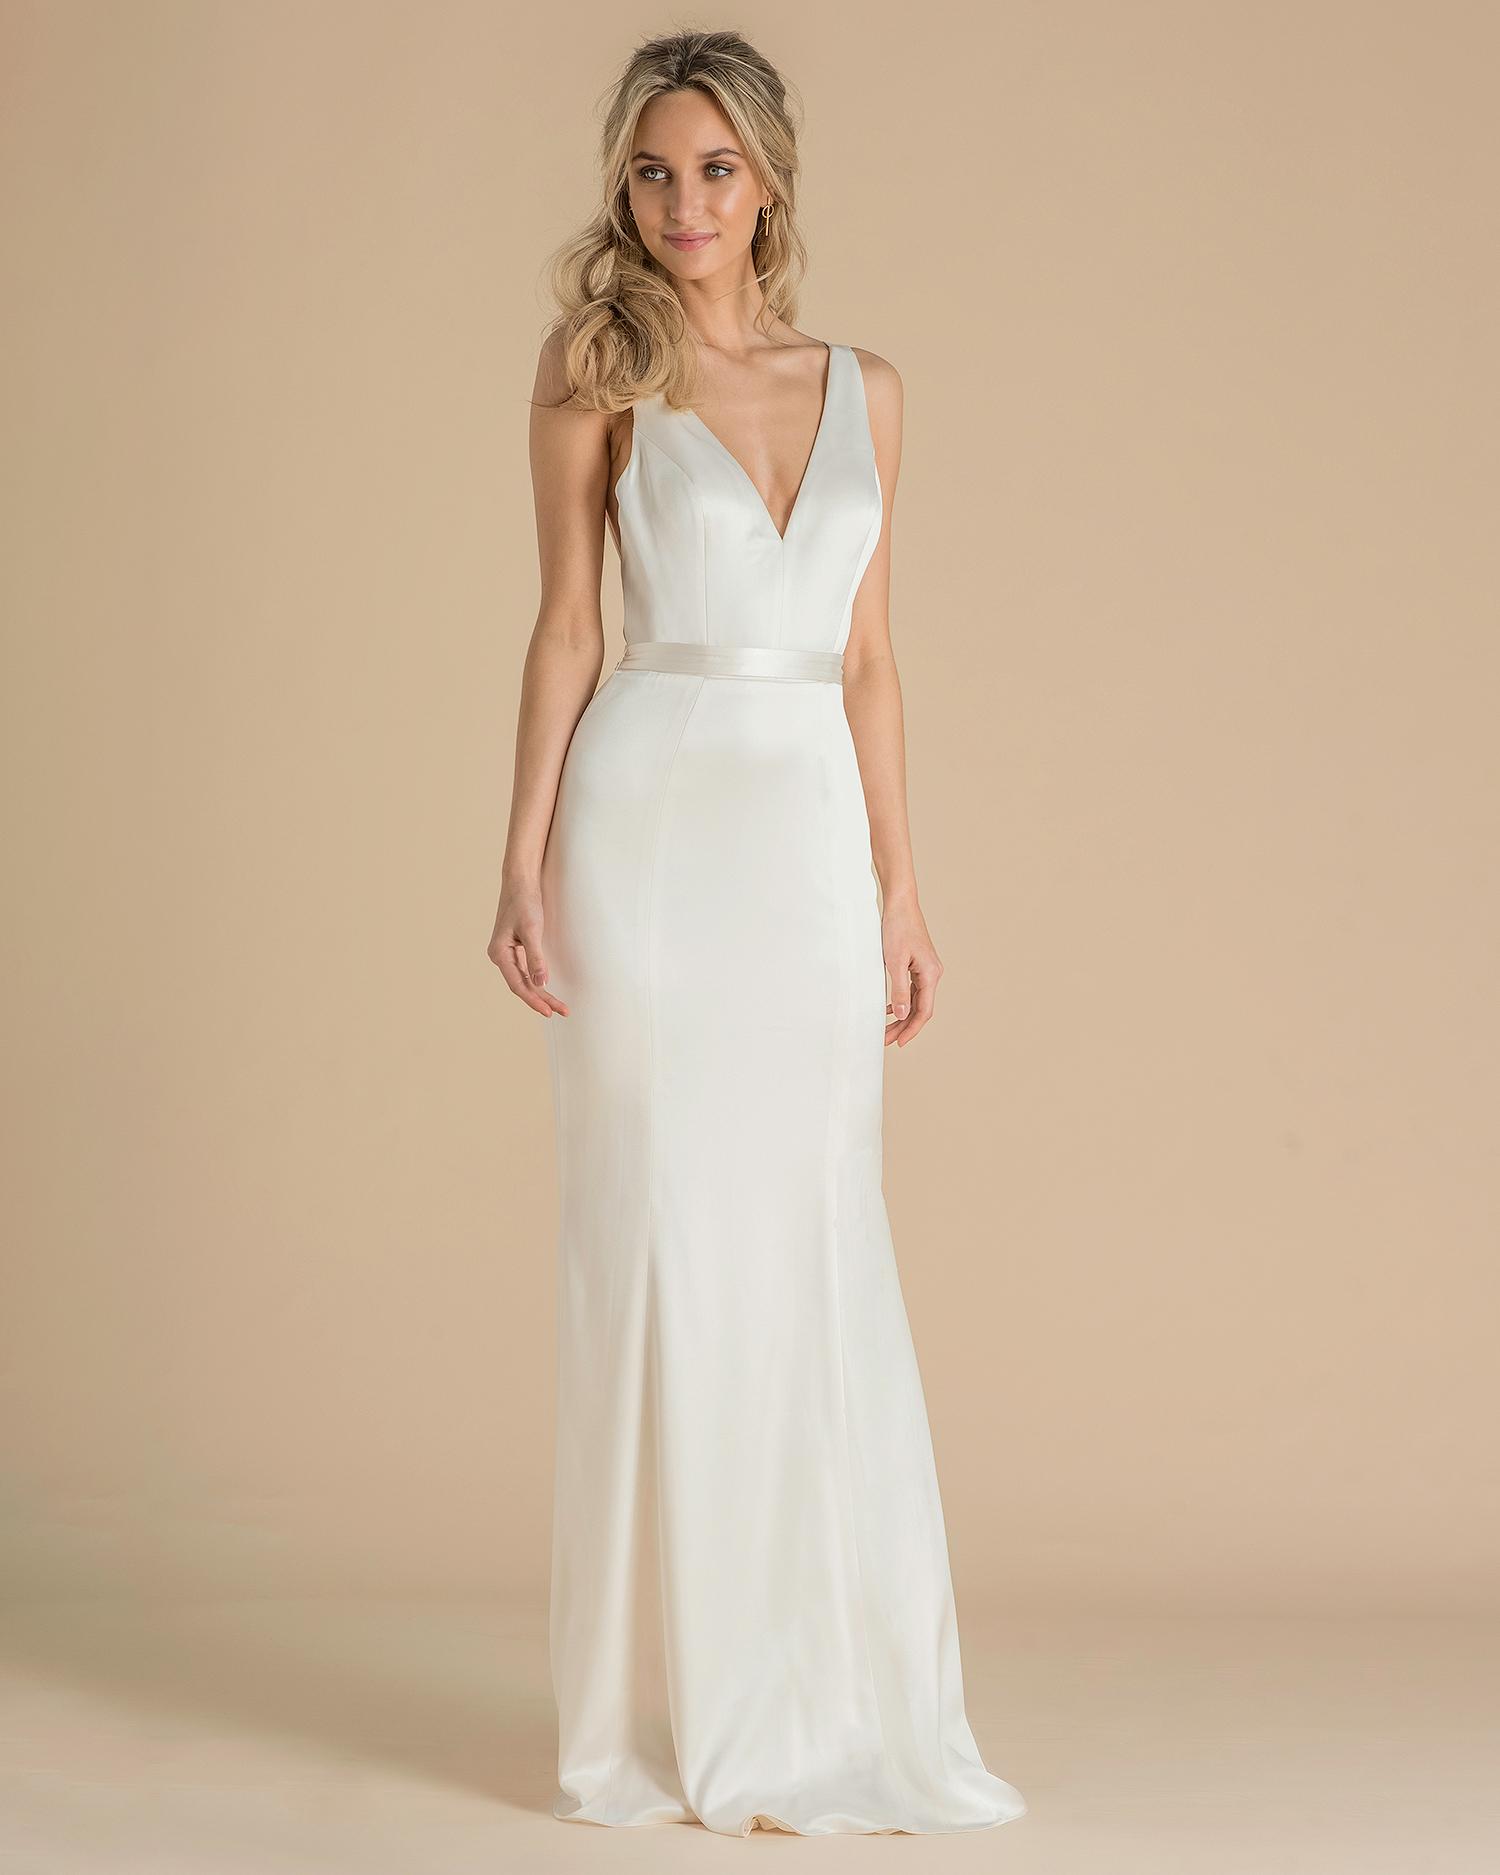 catherine deane wedding dress spring 2019 classic belted sheath